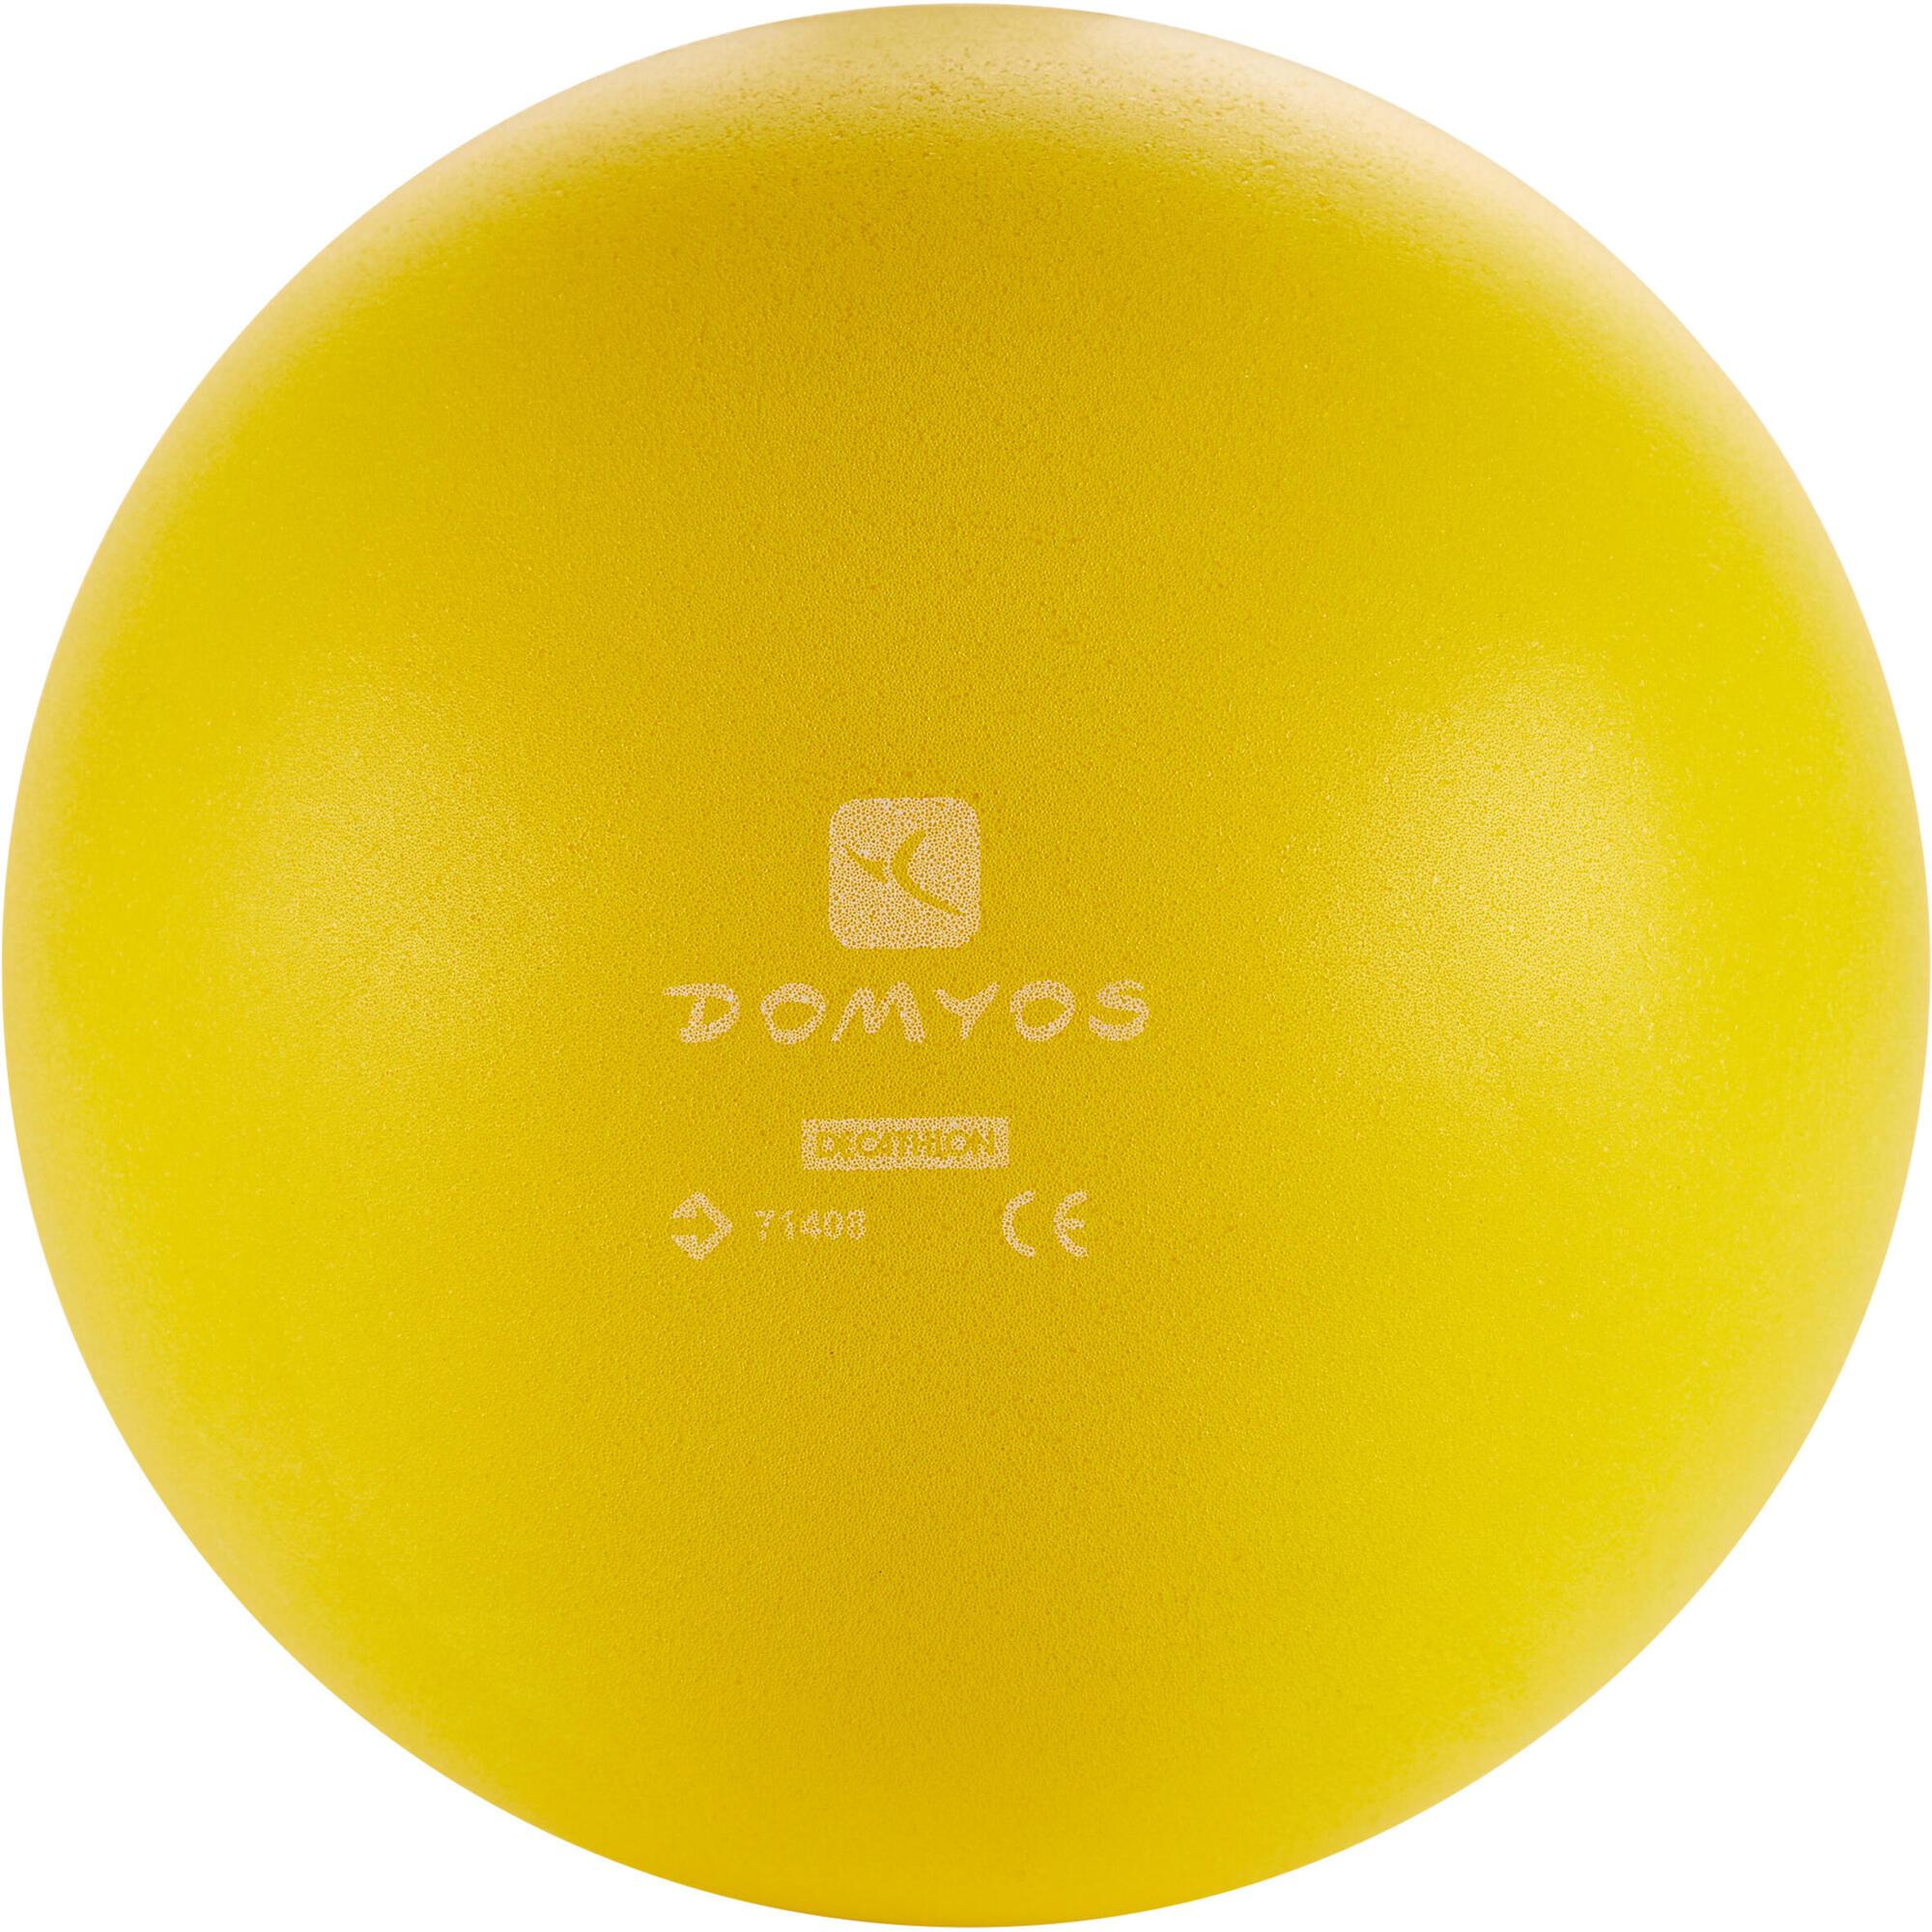 ballon mousse jaune domyos by decathlon. Black Bedroom Furniture Sets. Home Design Ideas